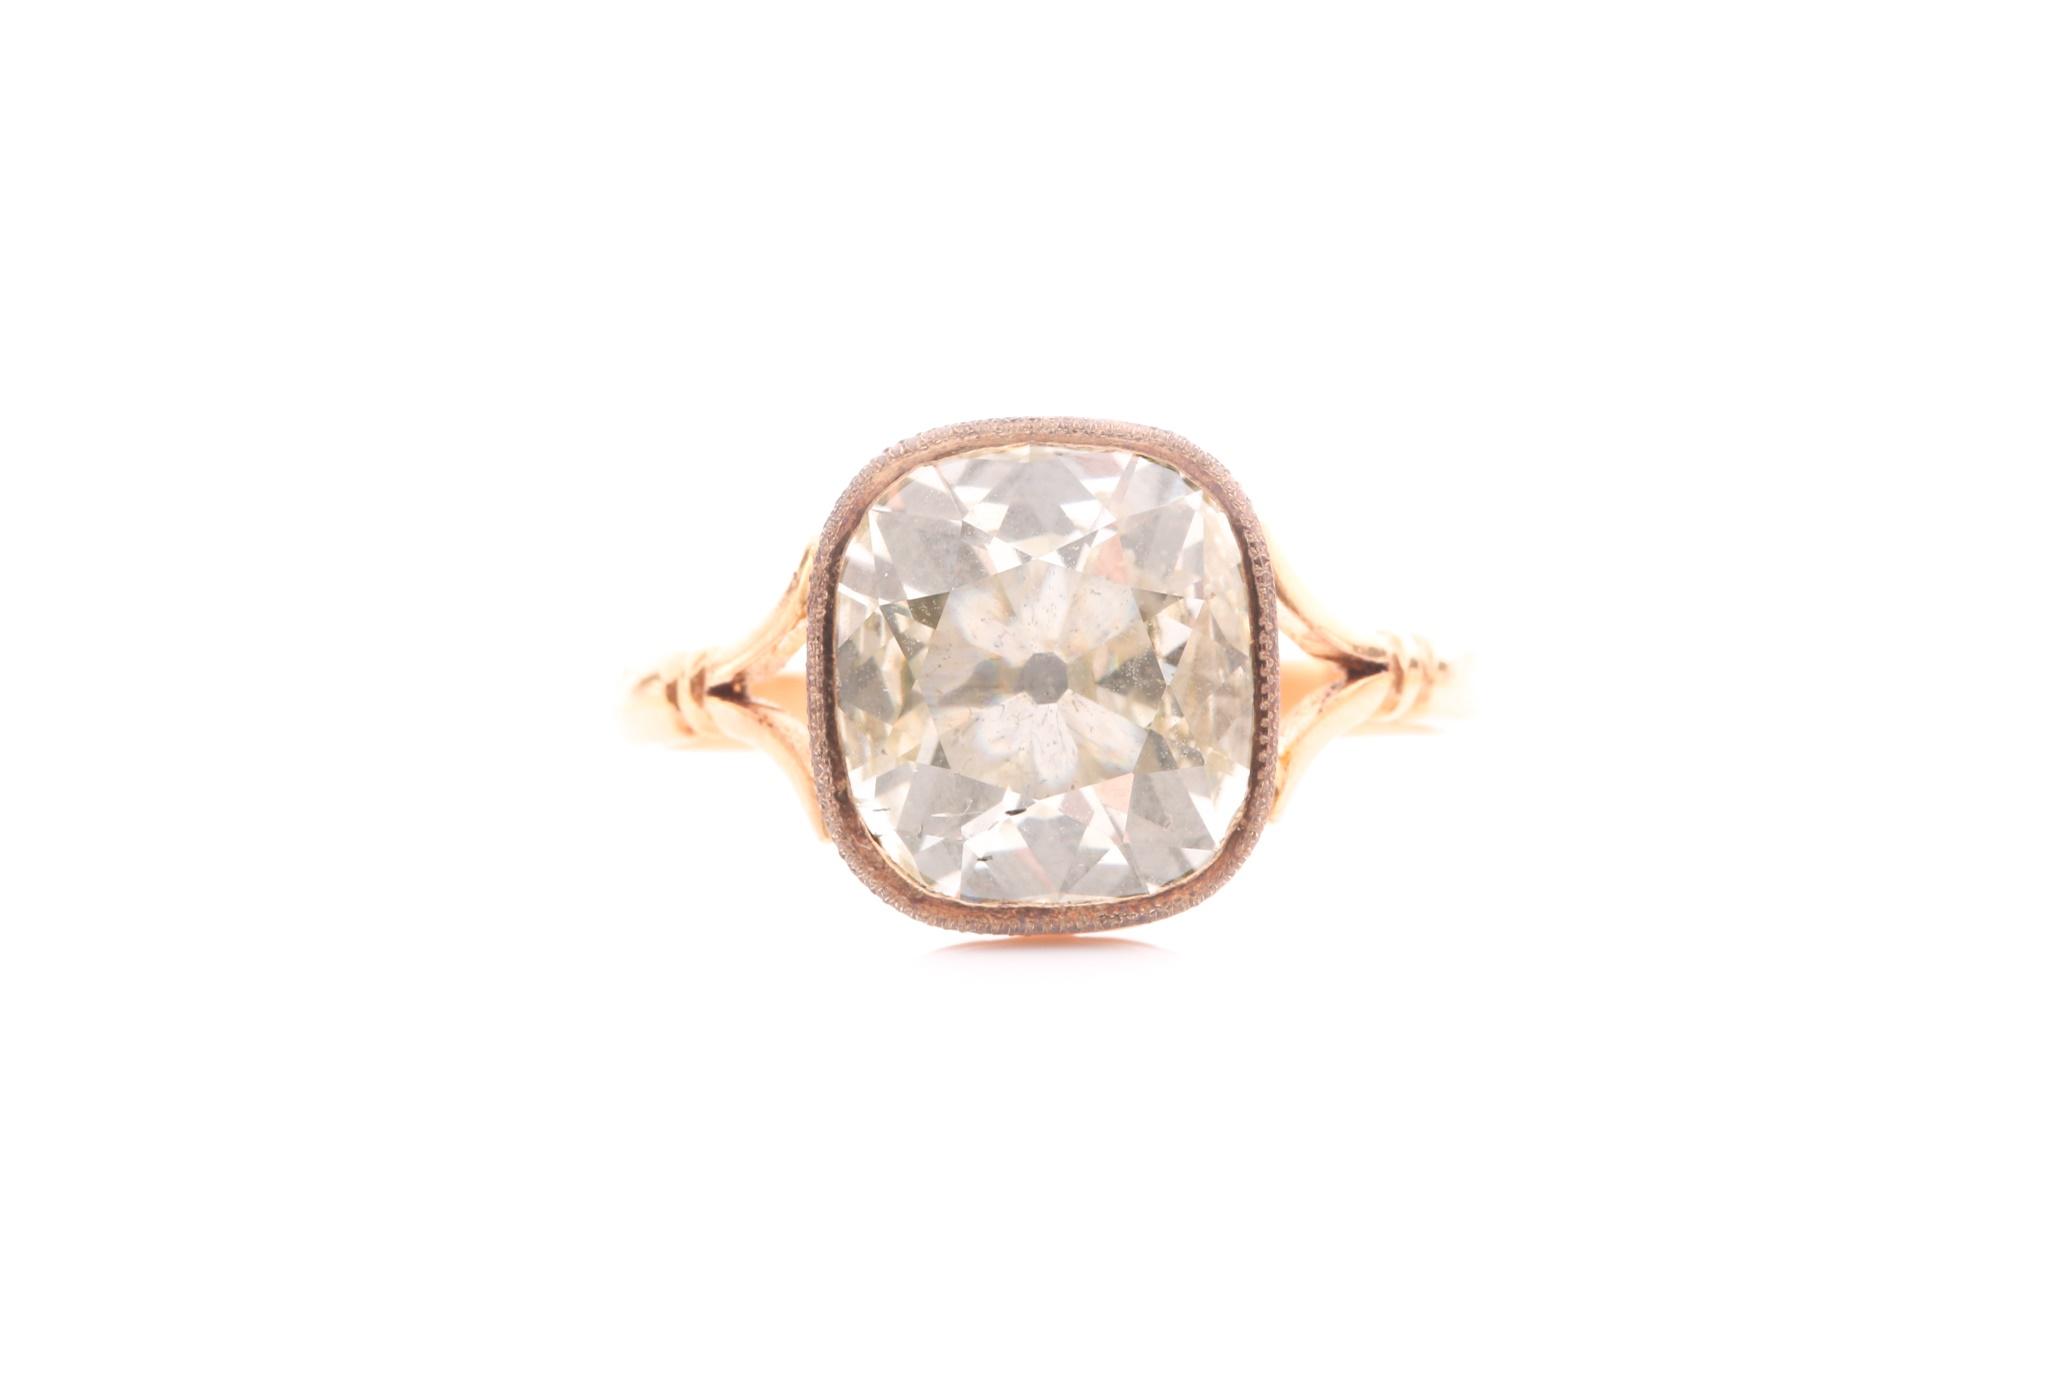 a Georgian style diamond ring